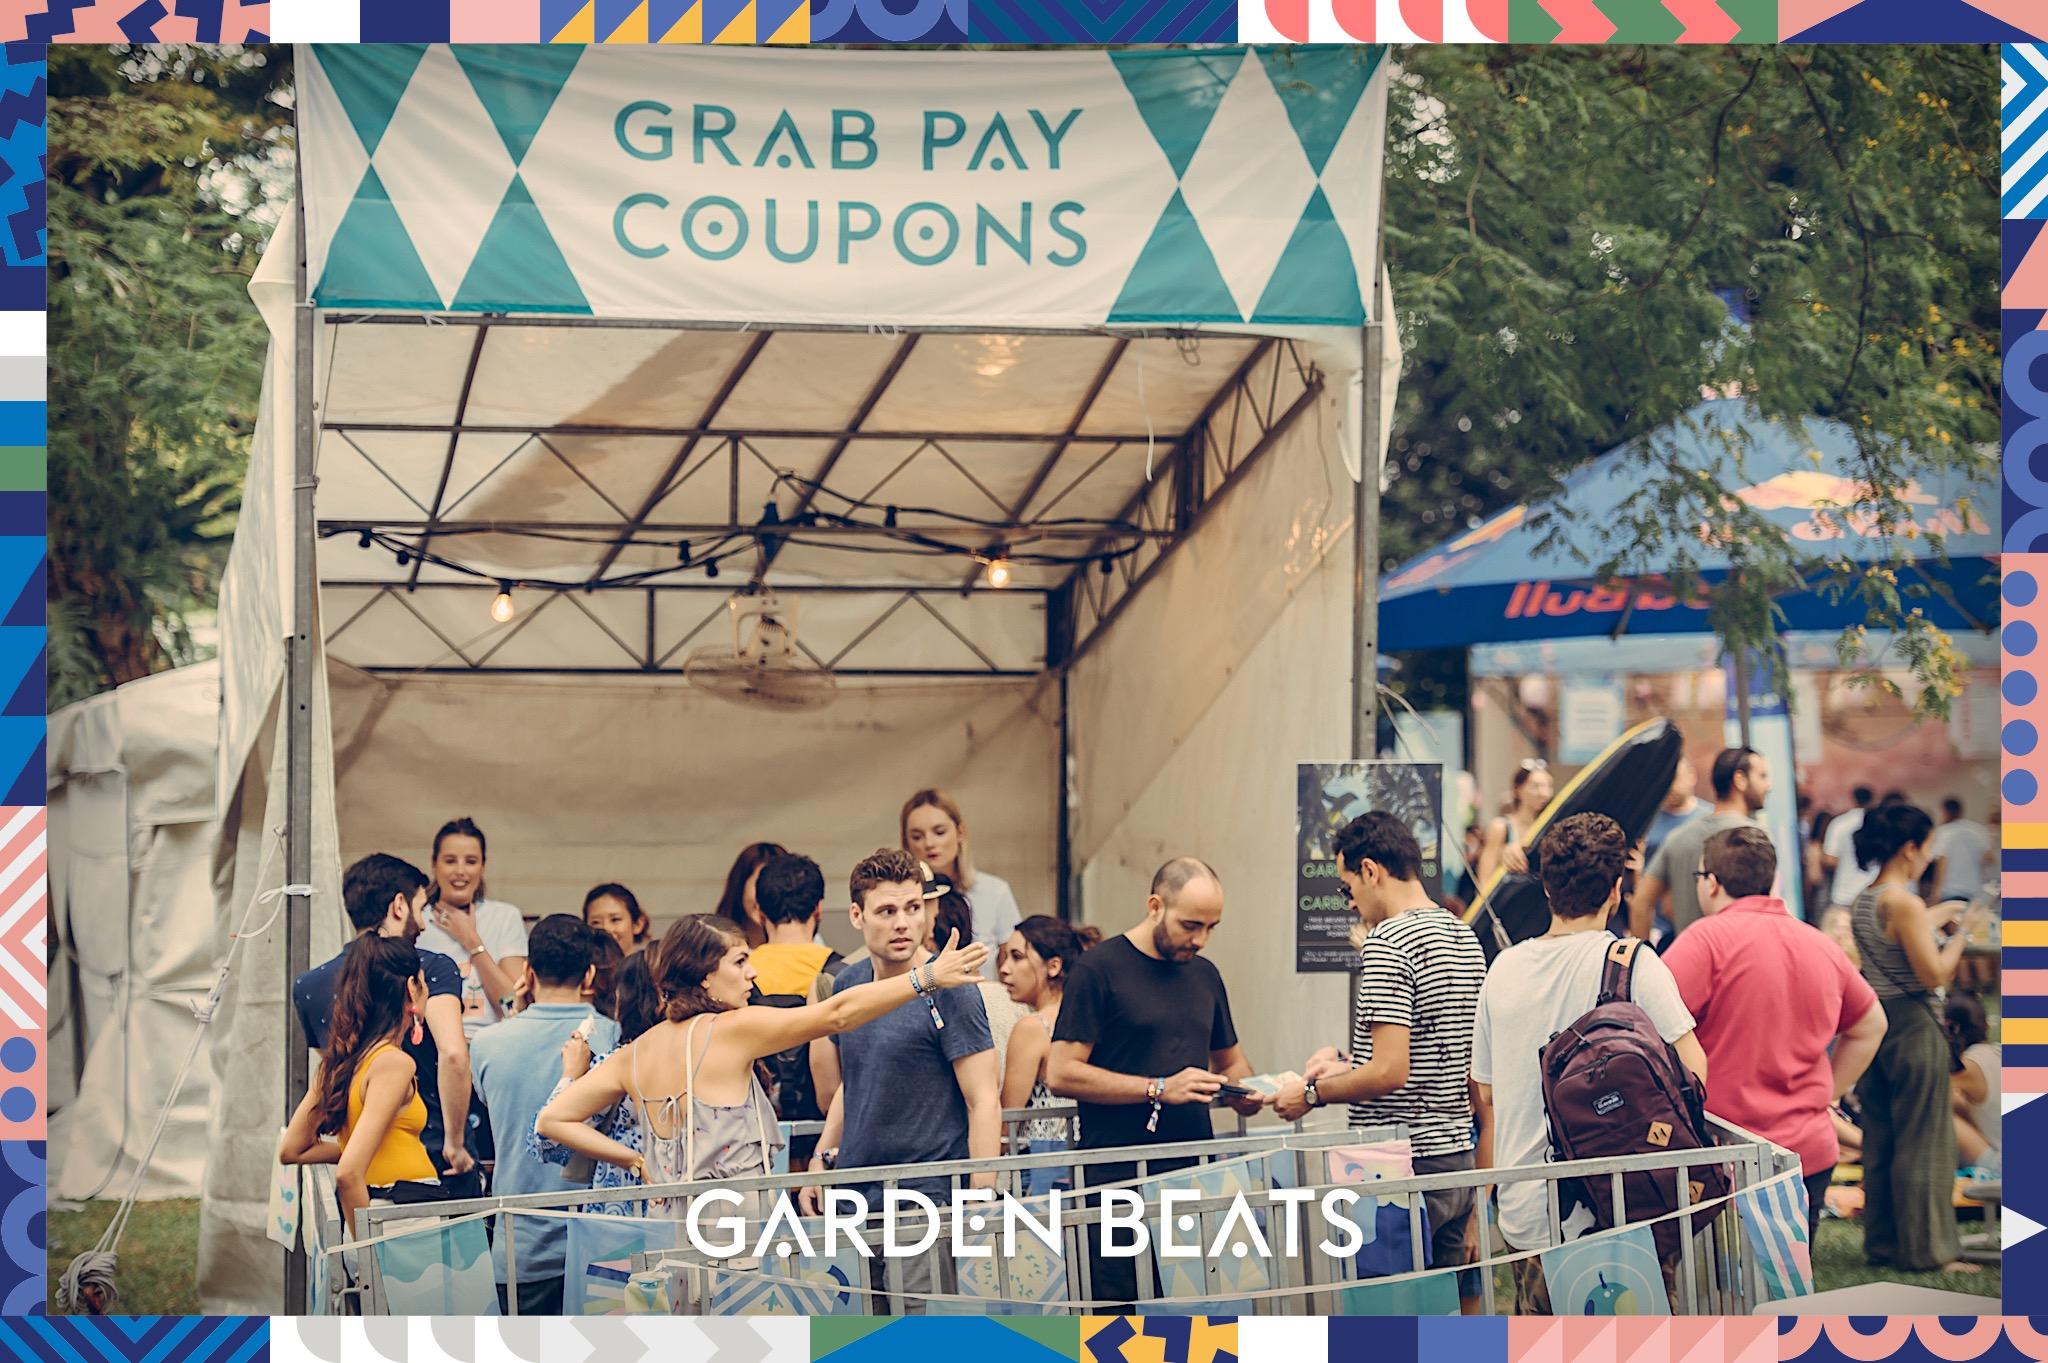 03032018_GardenBeats_Colossal513_Watermarked.jpg